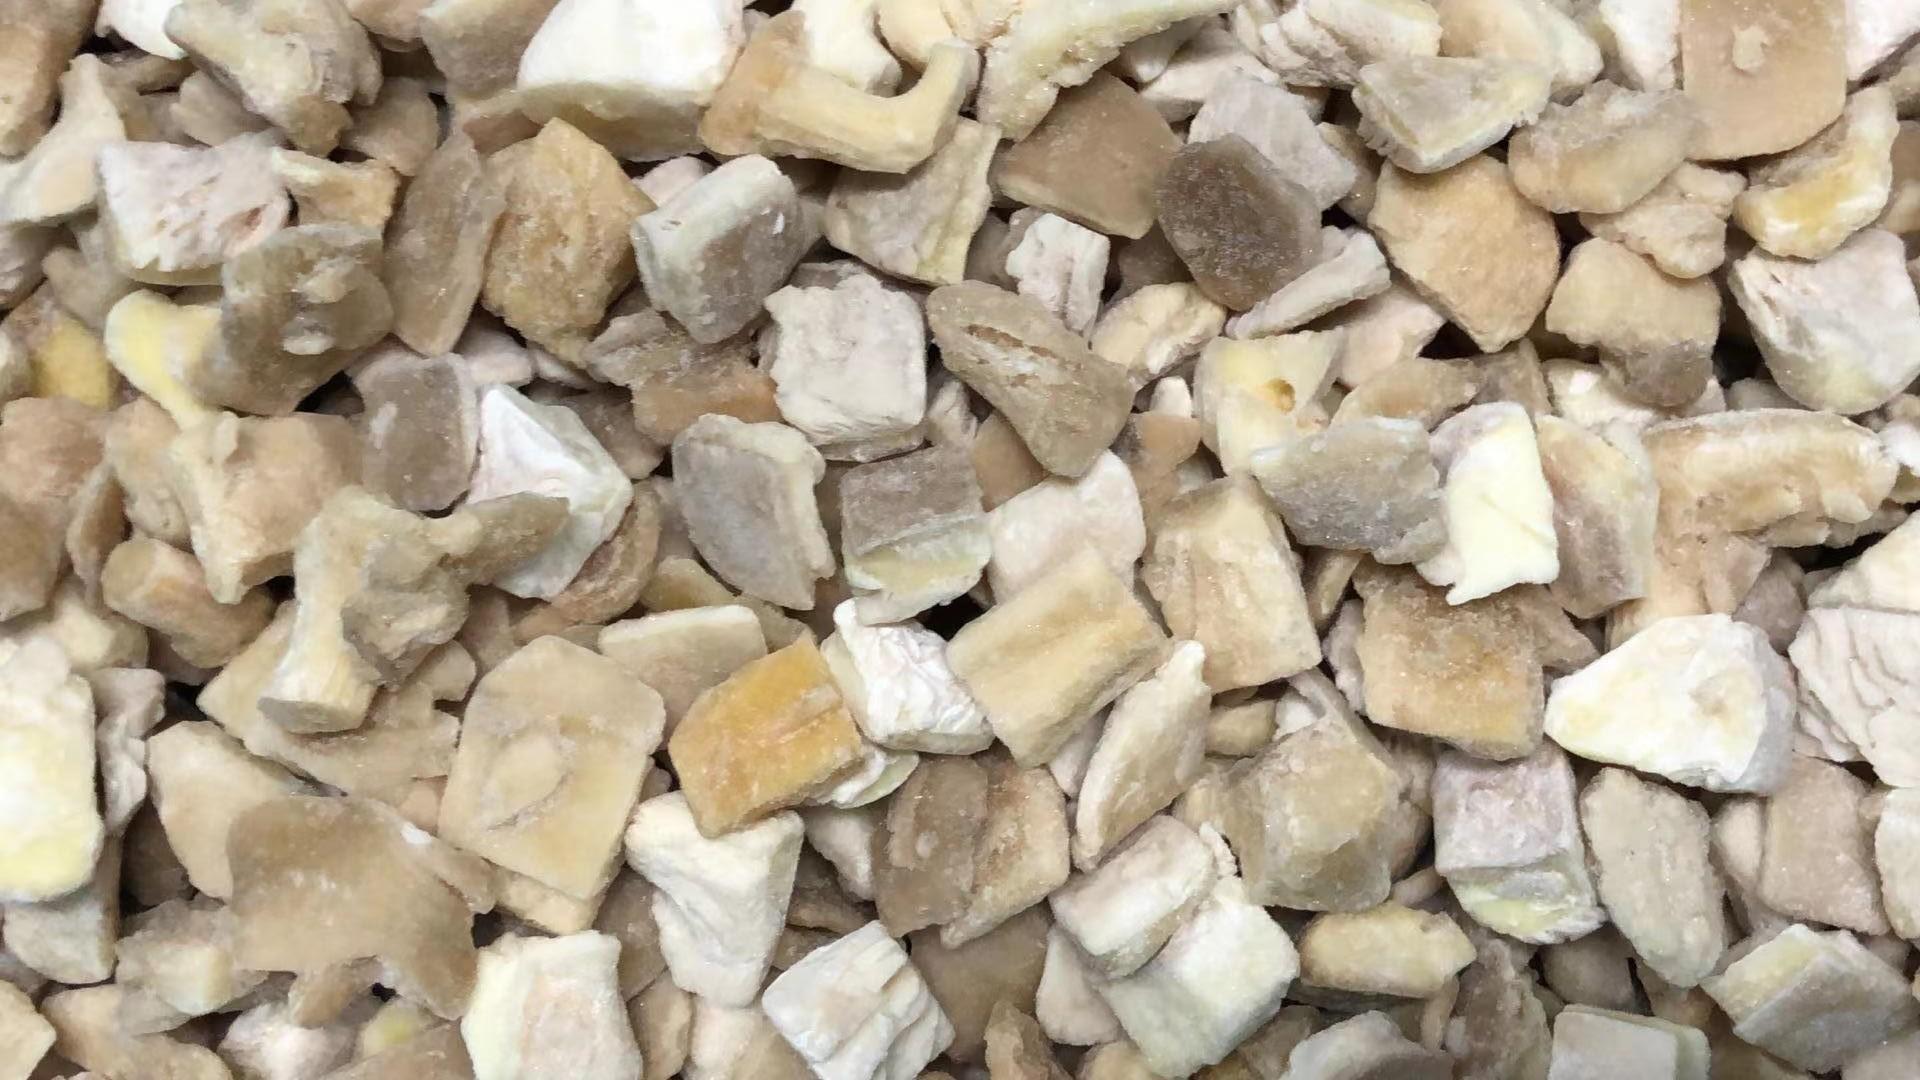 IQF Mixed Mushrooms,Frozen Mixed Mushrooms,Mushrooms Blend,Wild Mushrooms Blend 13